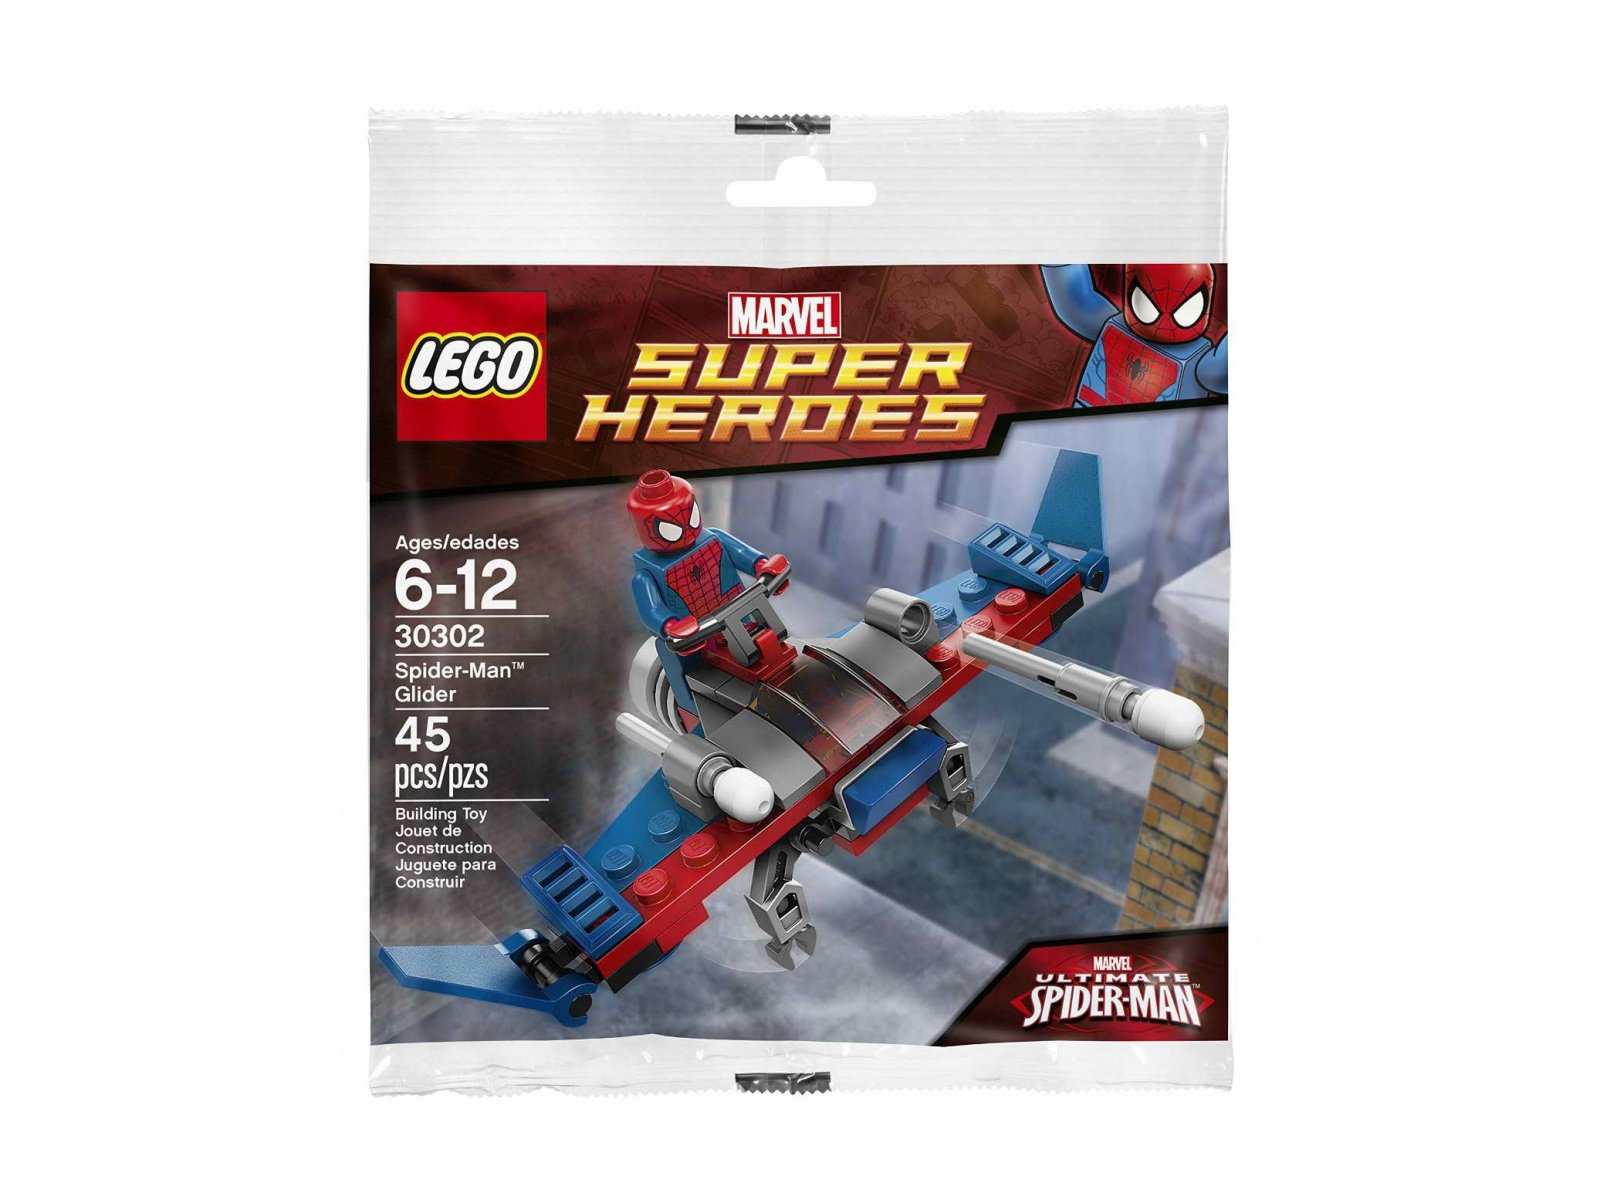 LEGO 30302 Marvel Super Heroes Spider-Man™ Glider